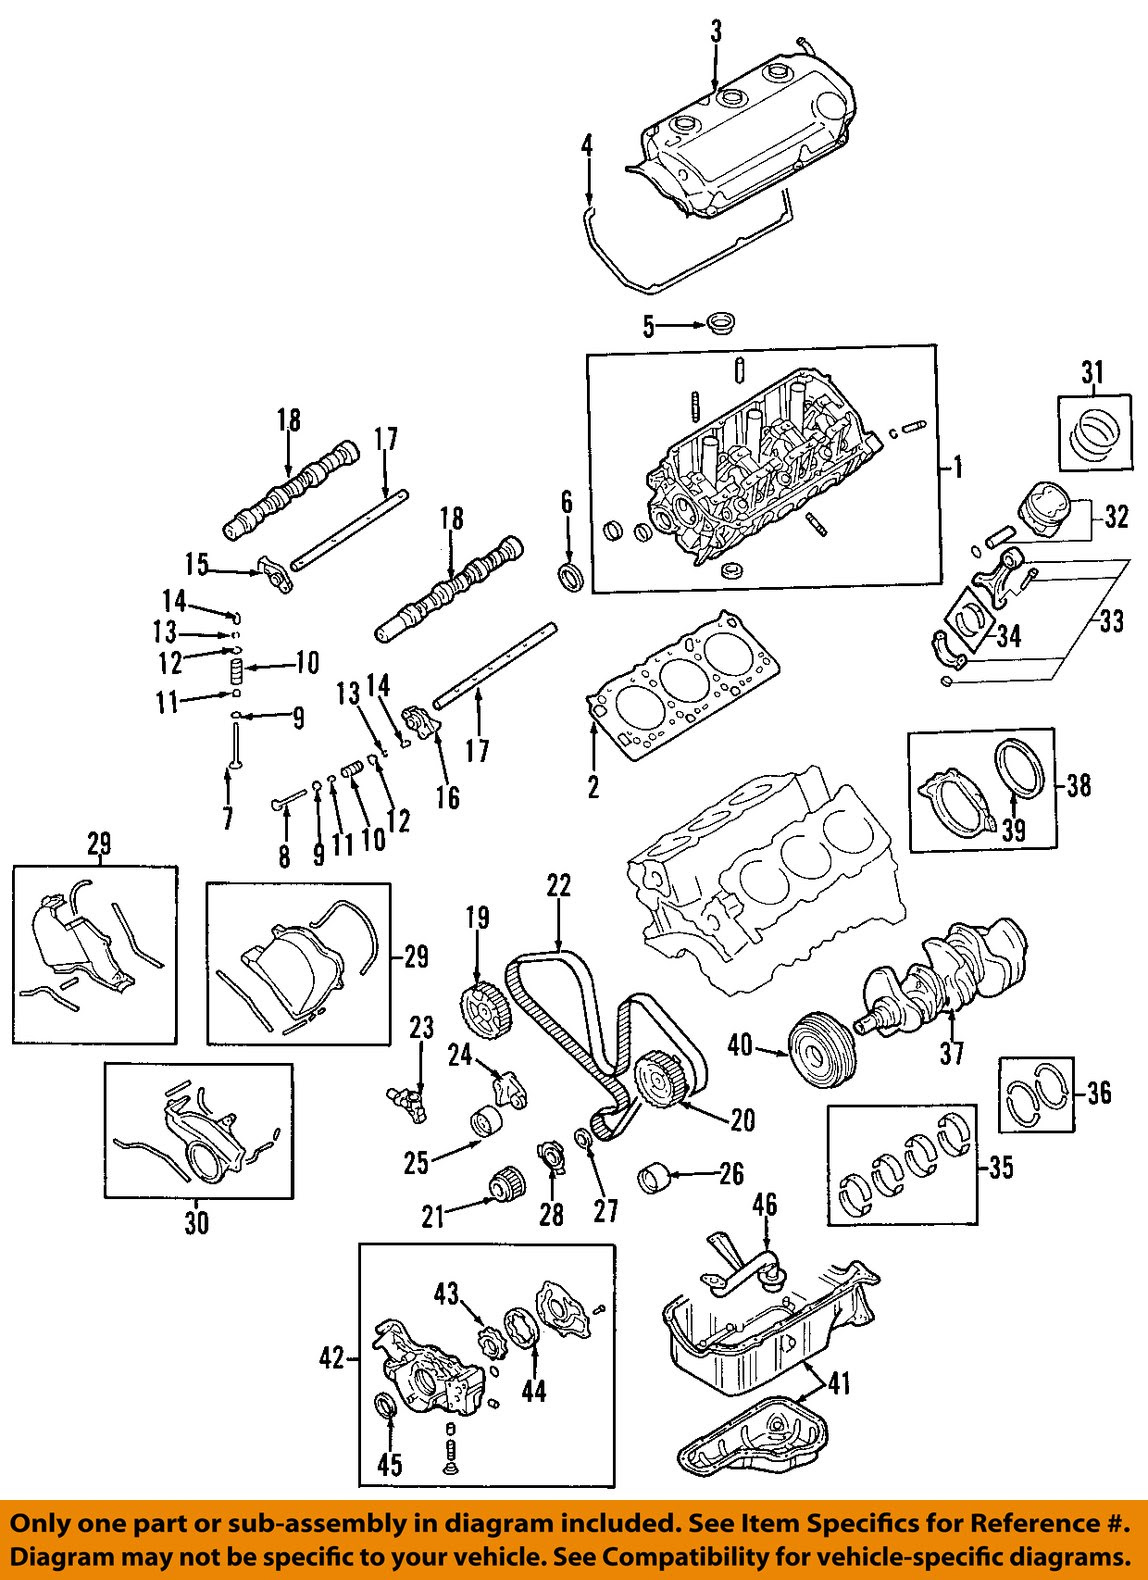 2002 Mitsubishi Galant Wiring Diagram